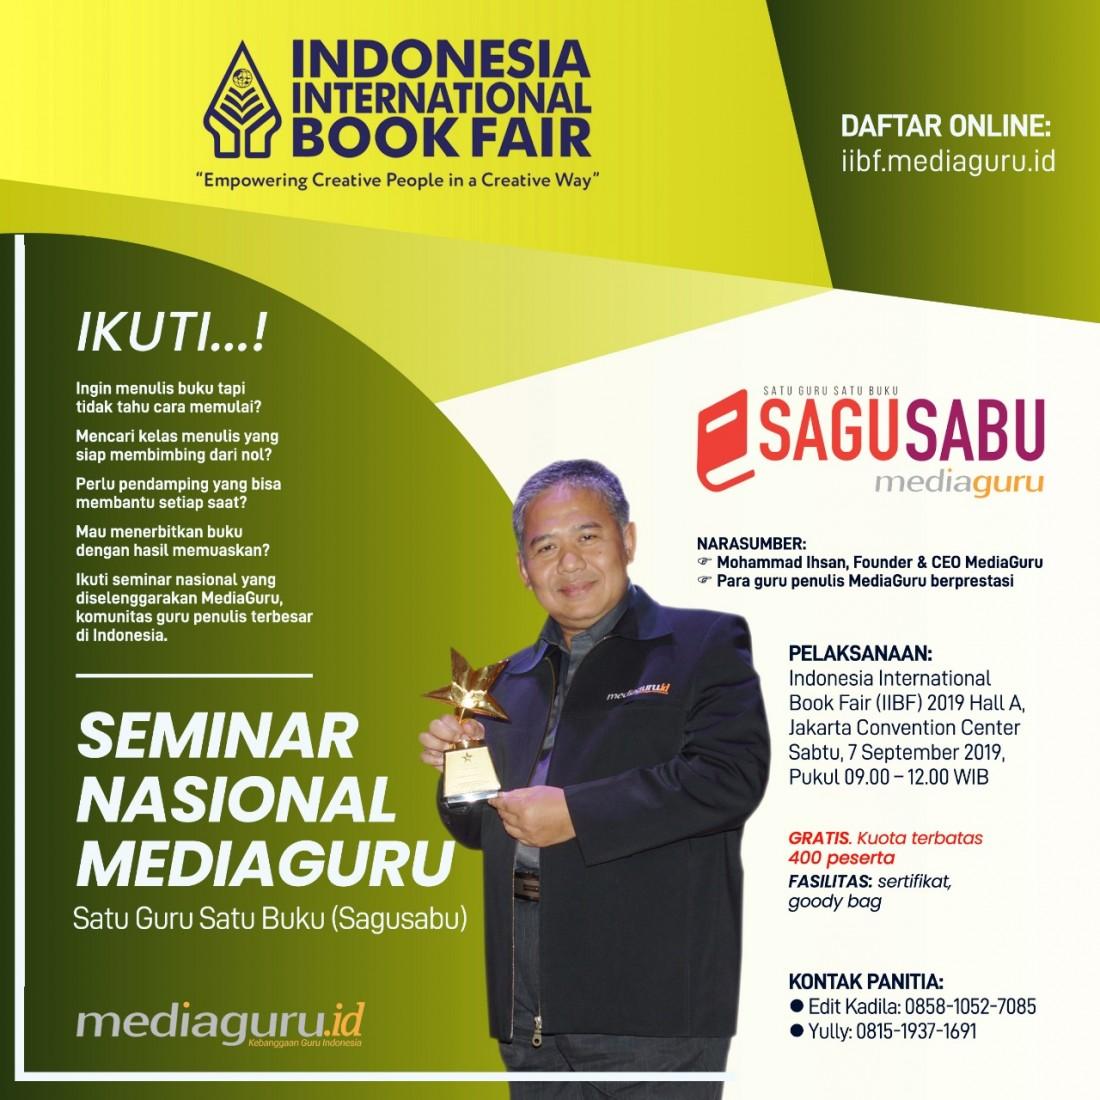 Seminar Nasional Satu Guru Satu Buku (Sagusabu), Jakarta (7 September 2019)